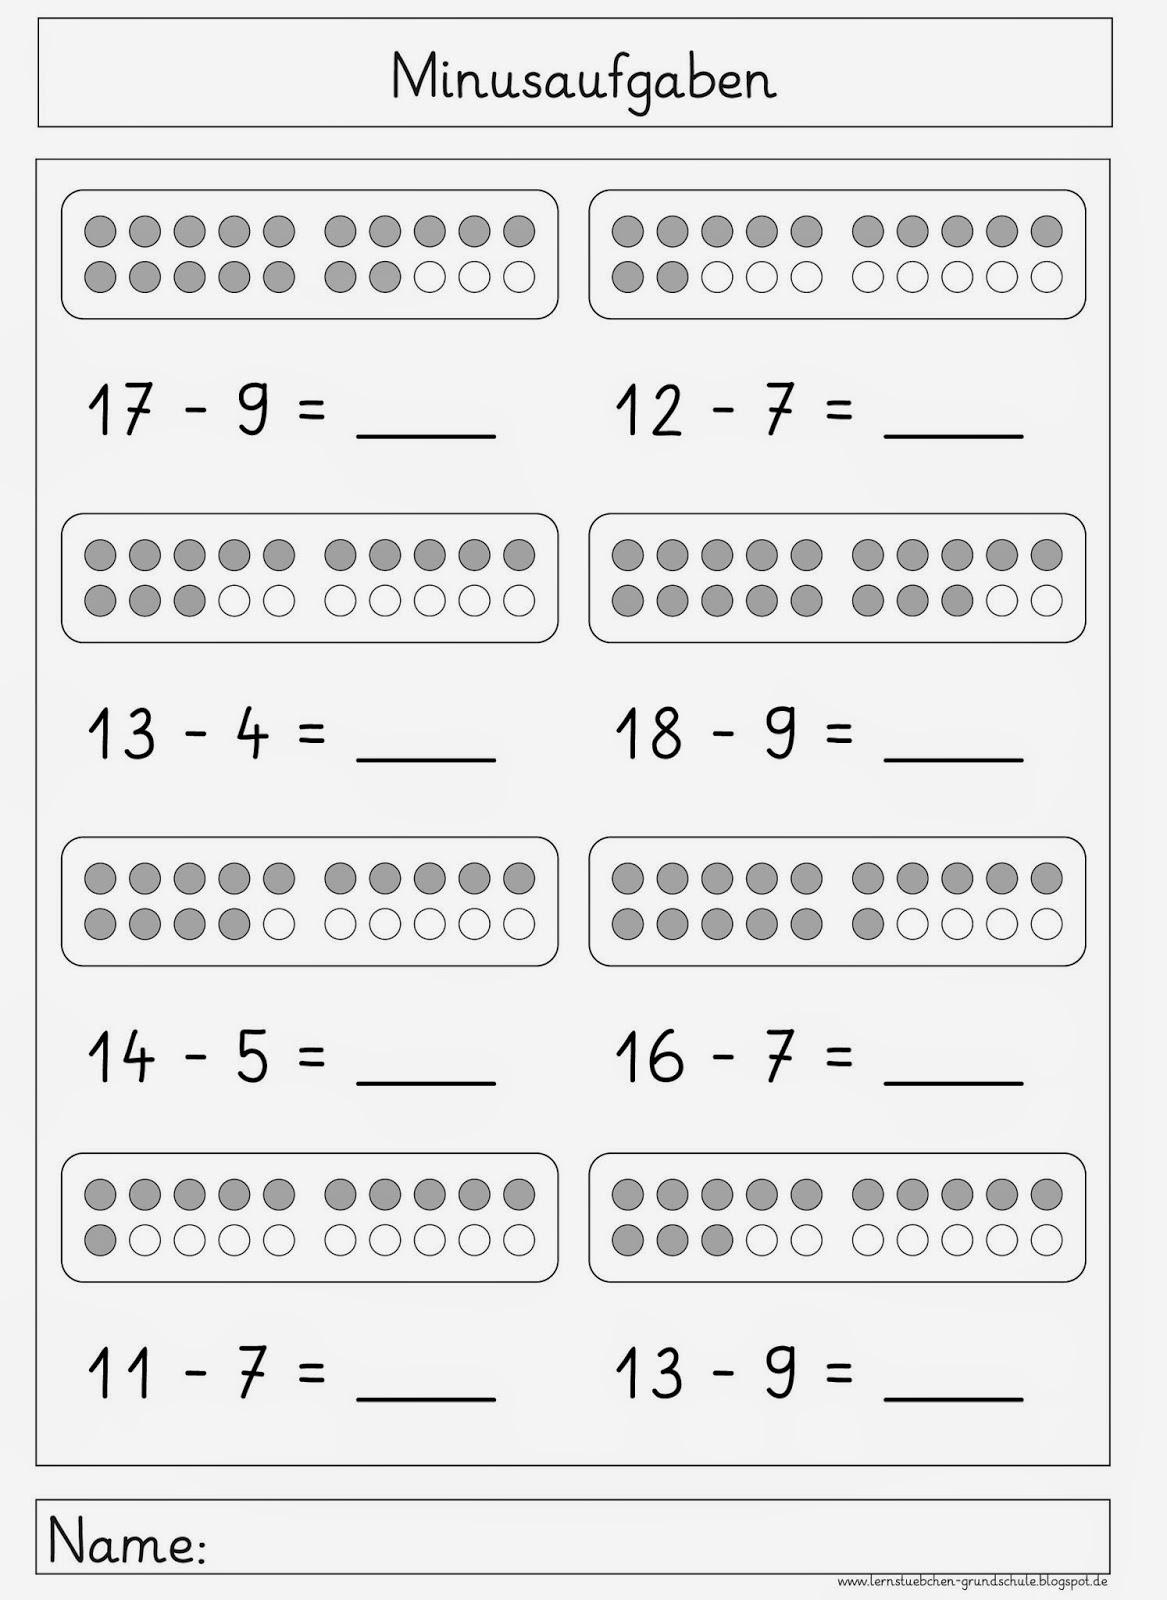 mathe grundschule klasse 4 arbeitsblätter - aol bildersuche